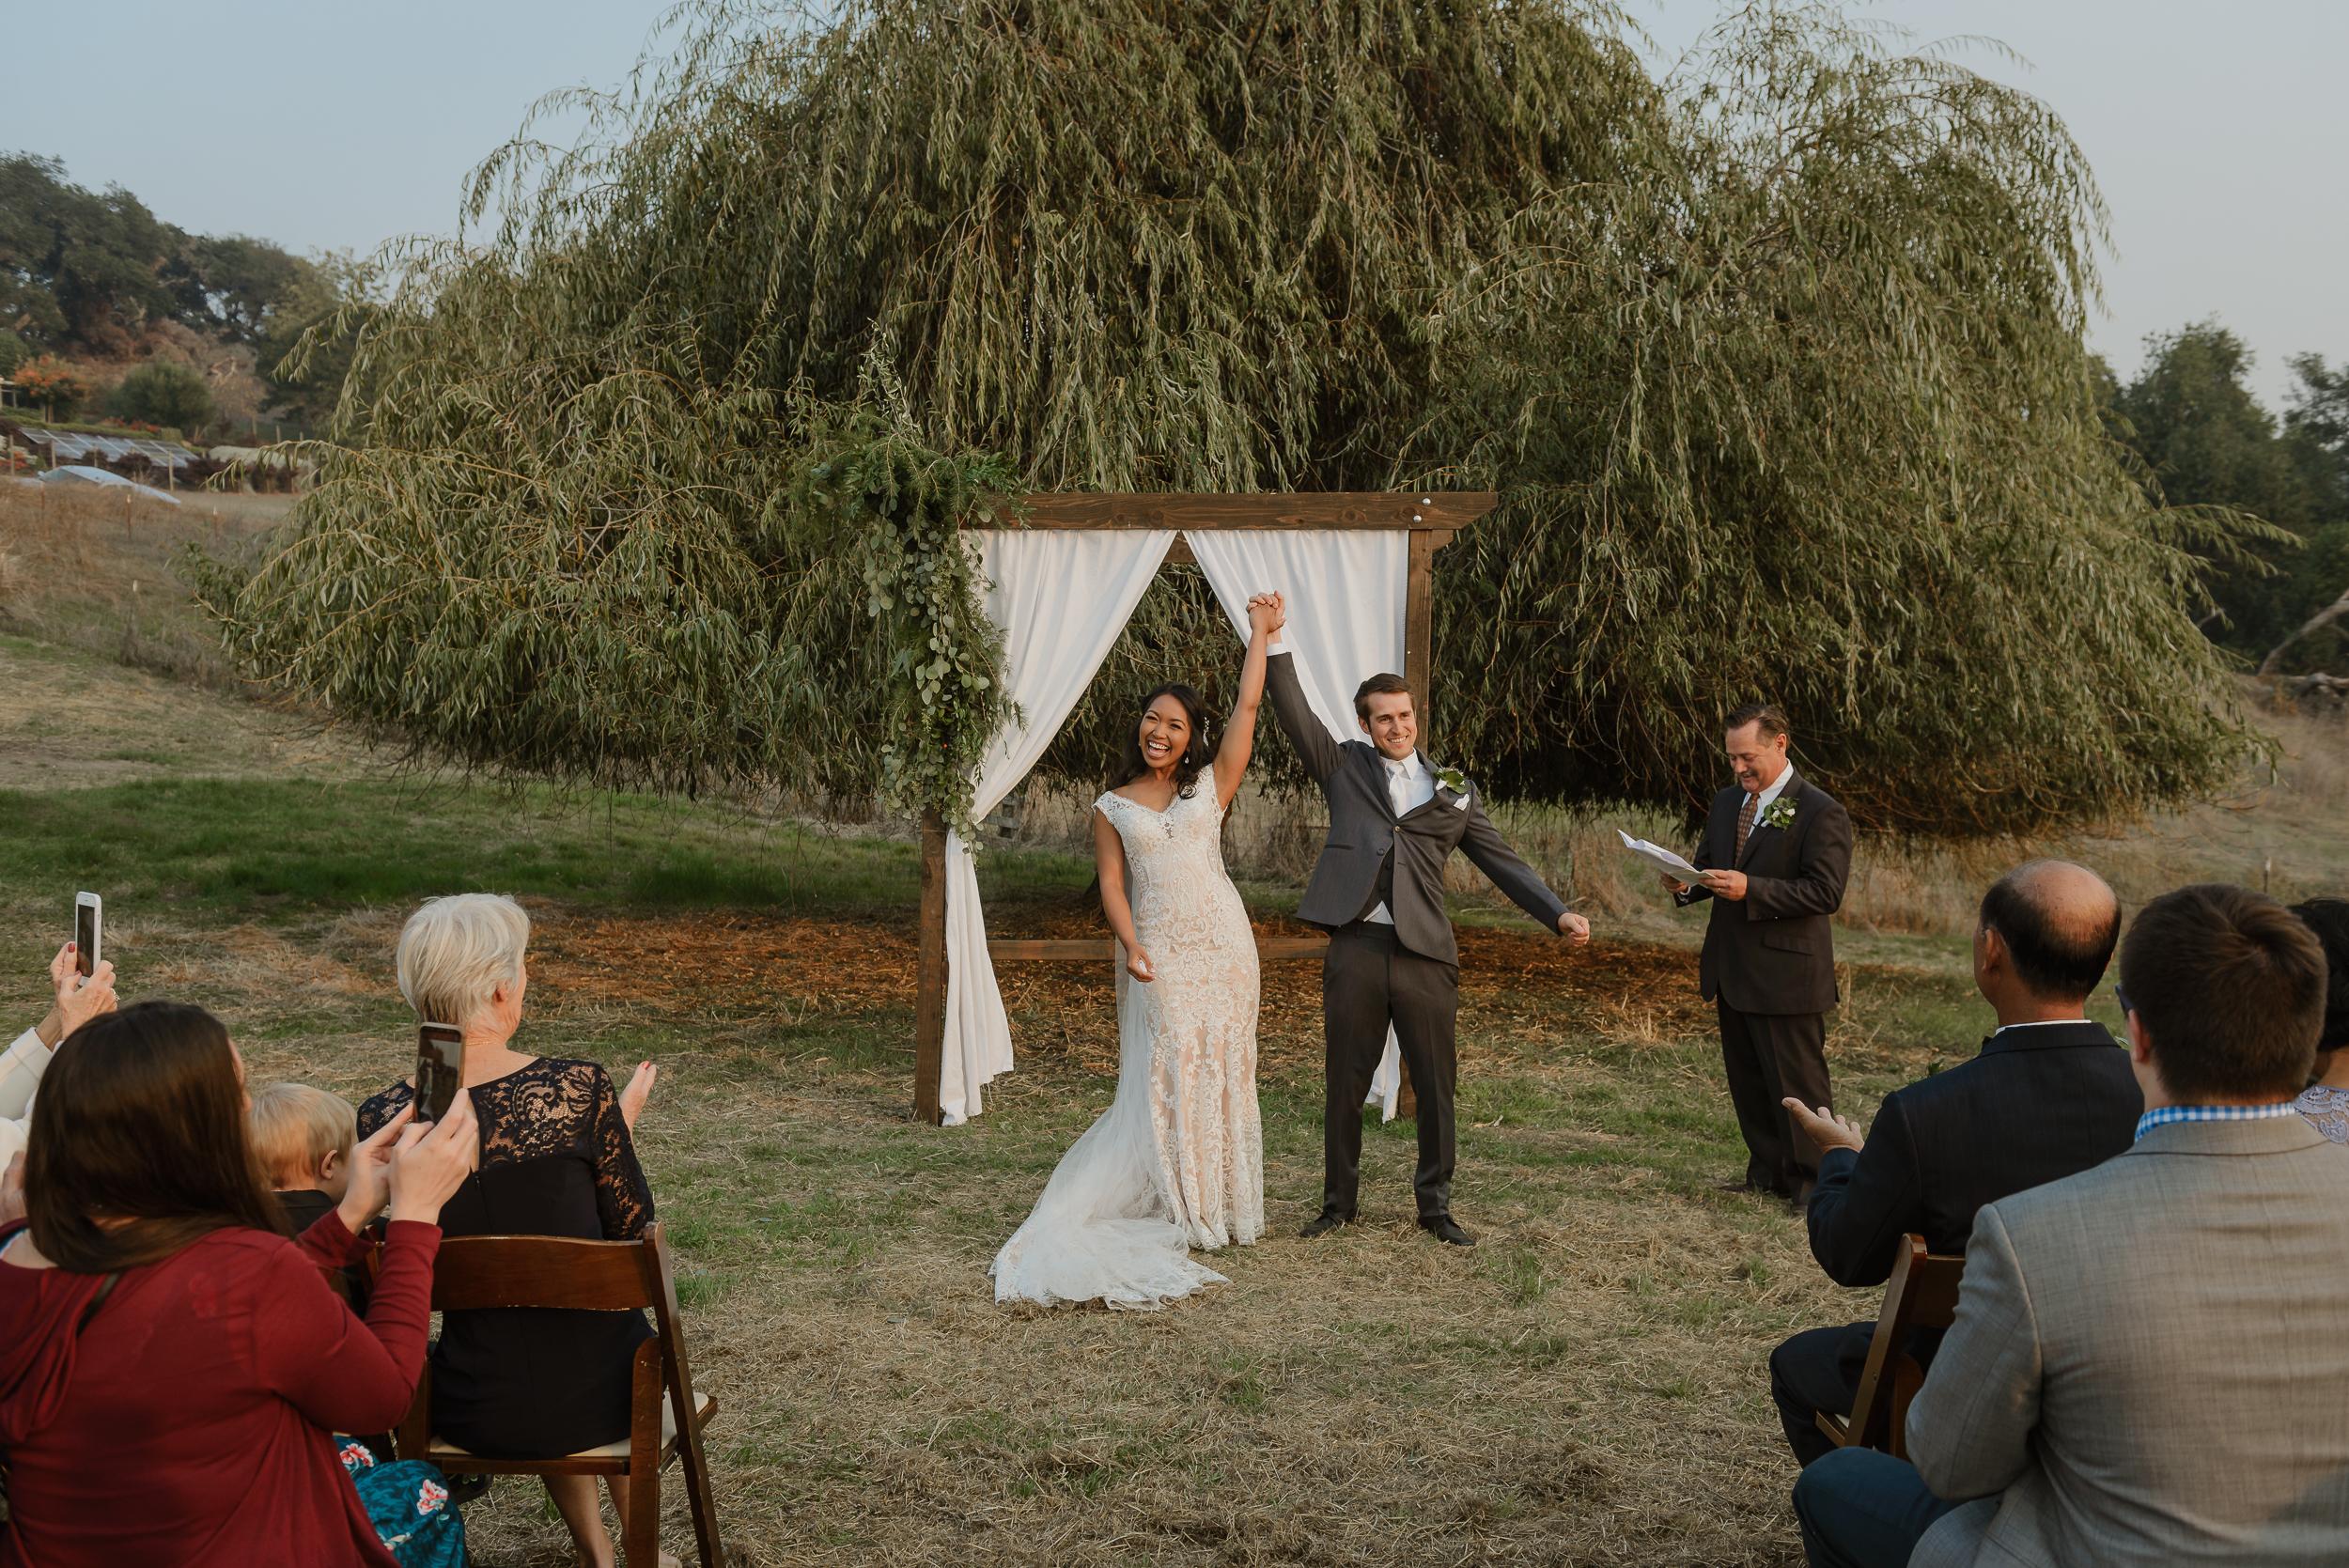 054marin-petaluma-backyard-wedding-vivianchen-344.jpg